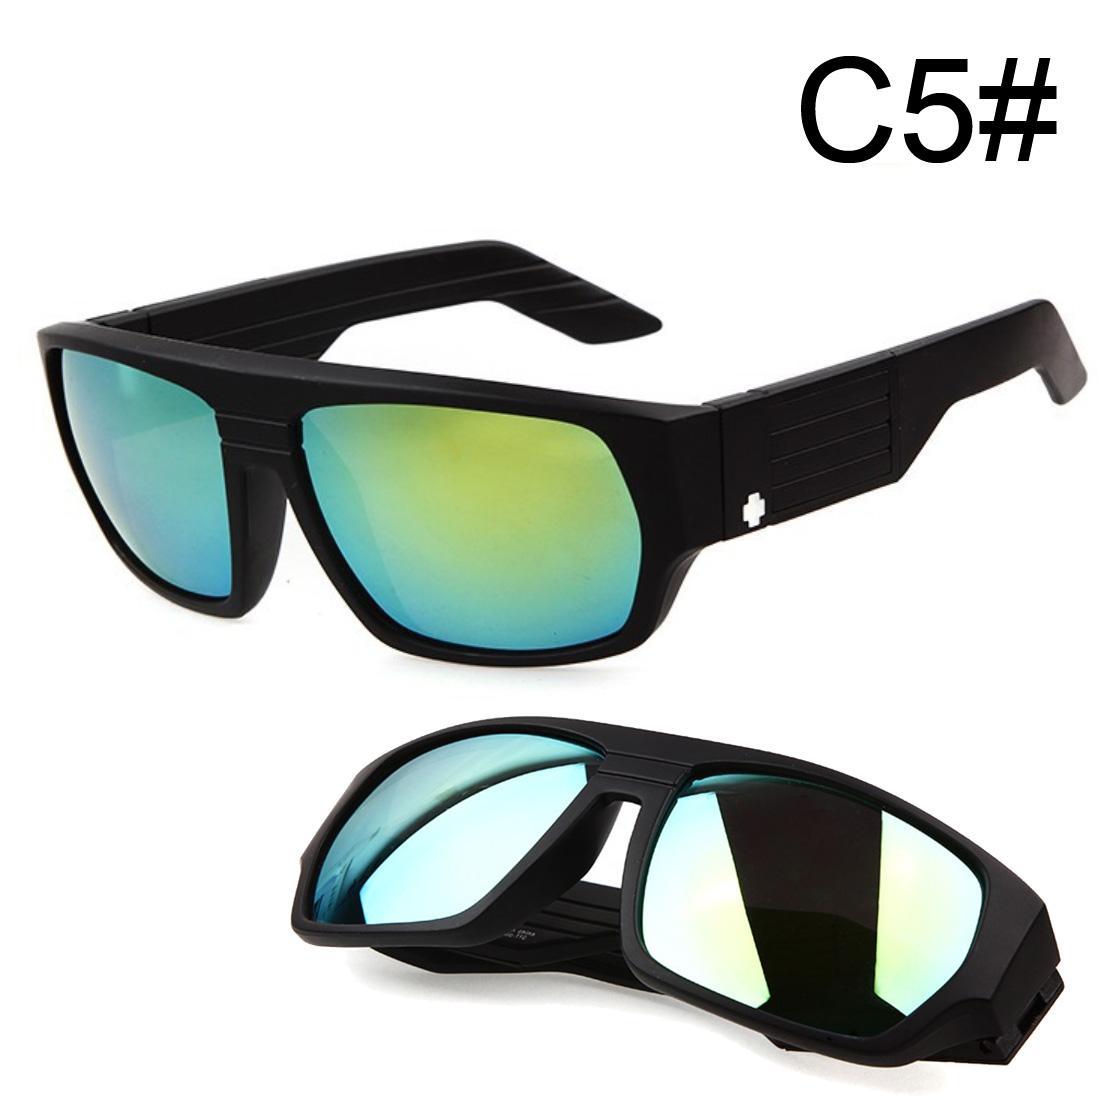 94092771fbb Spy Cycling Sunglasses